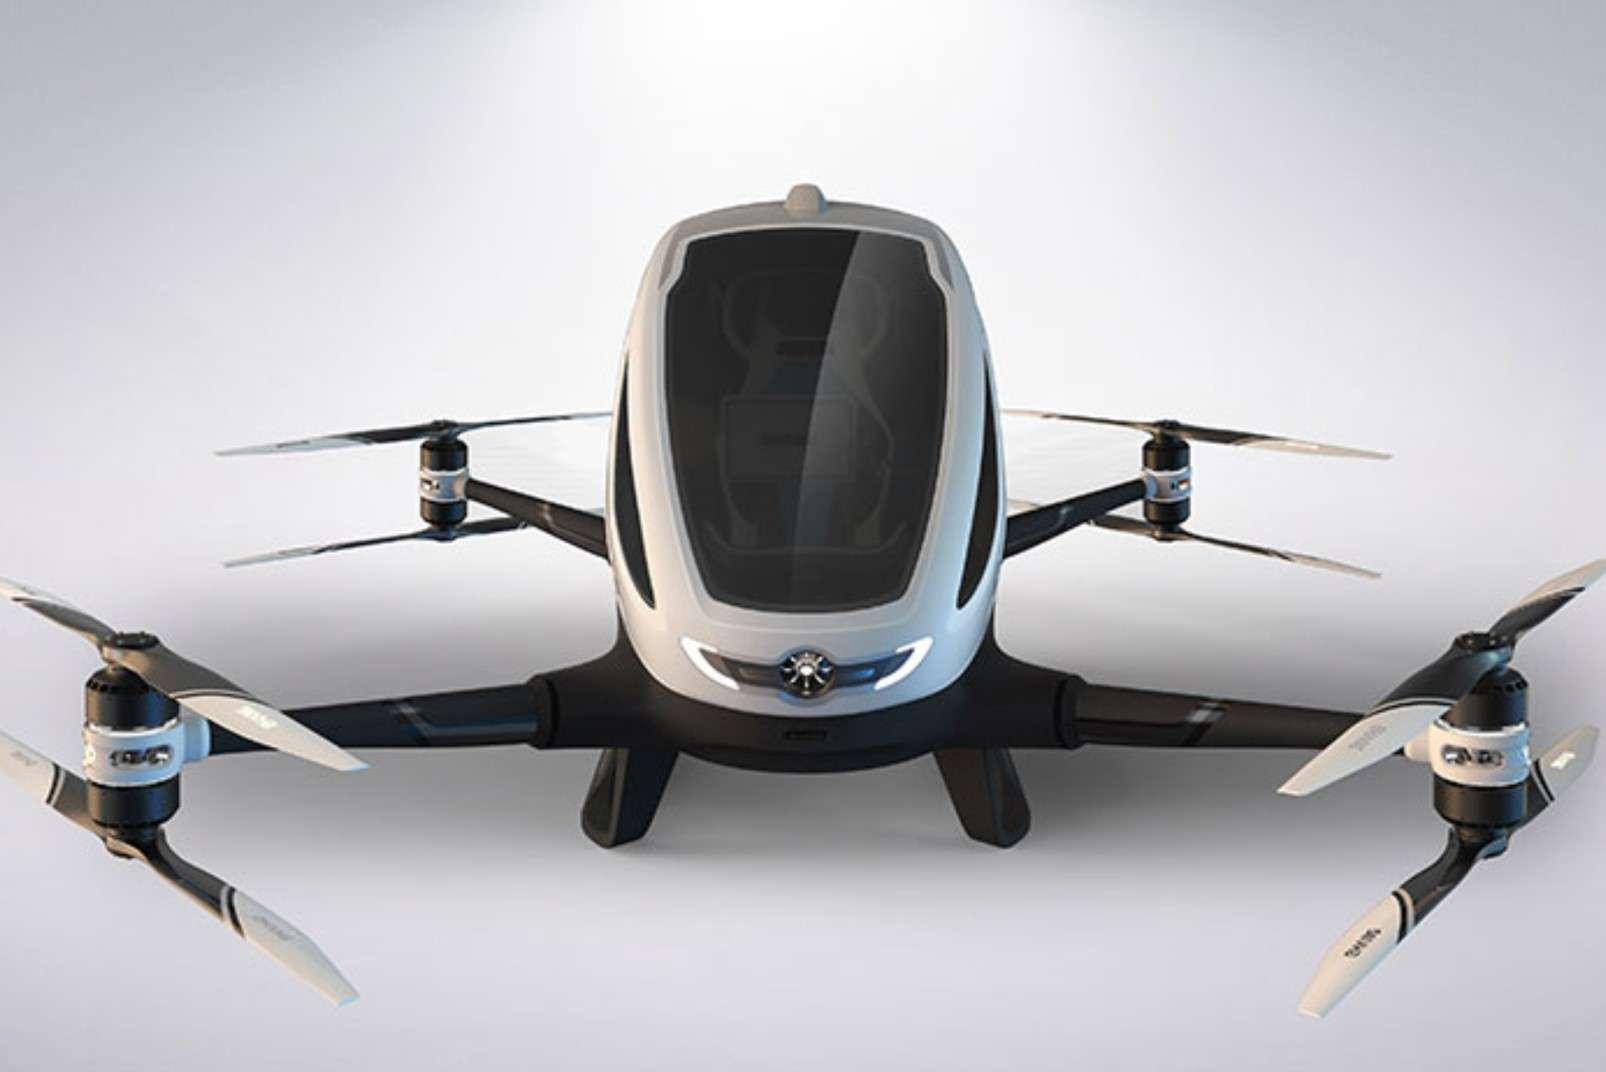 Ehang passenger-carrying drone